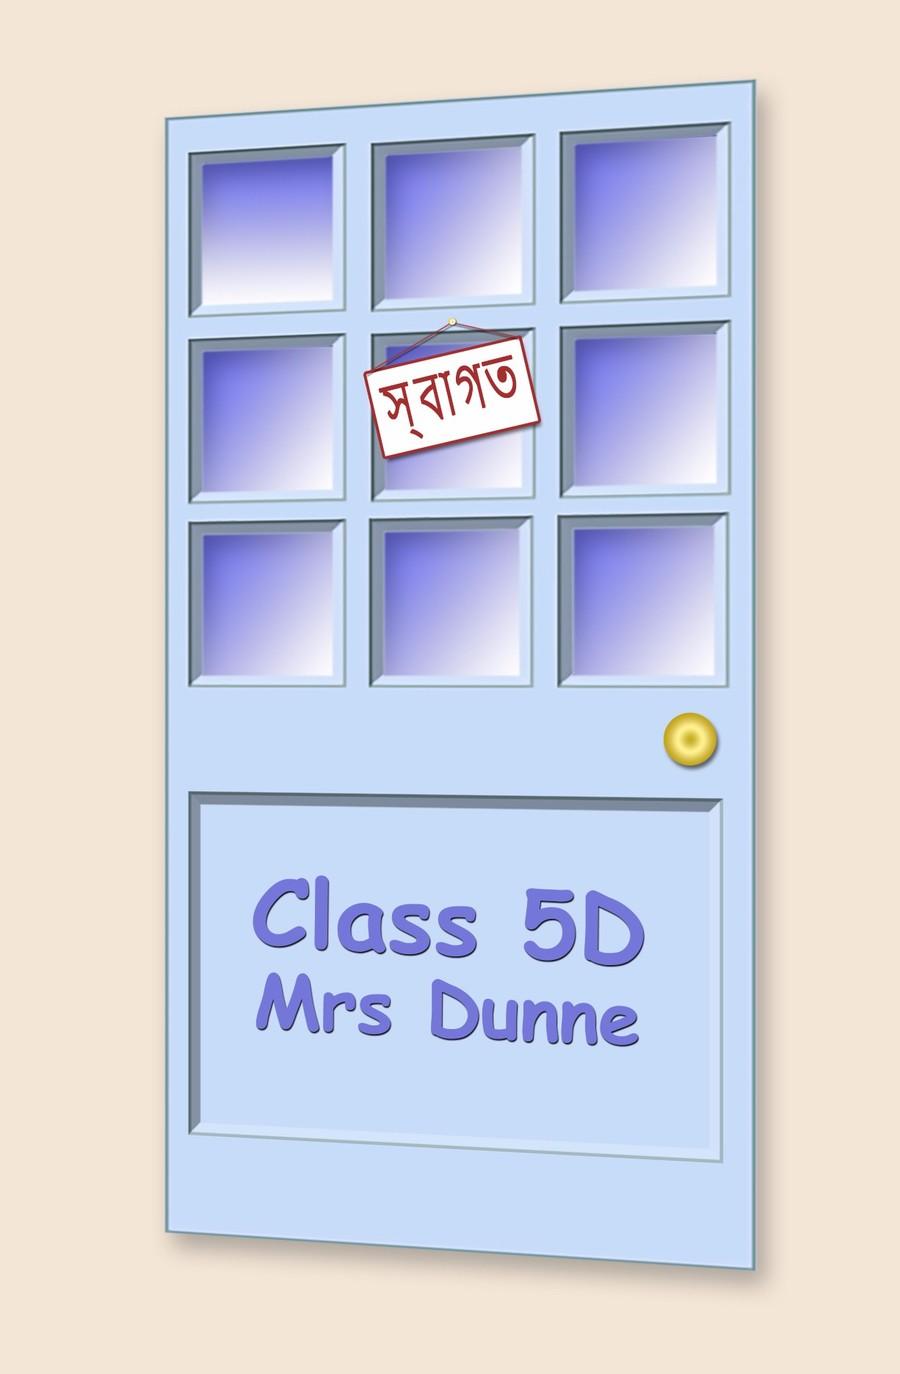 Go to Class 5D